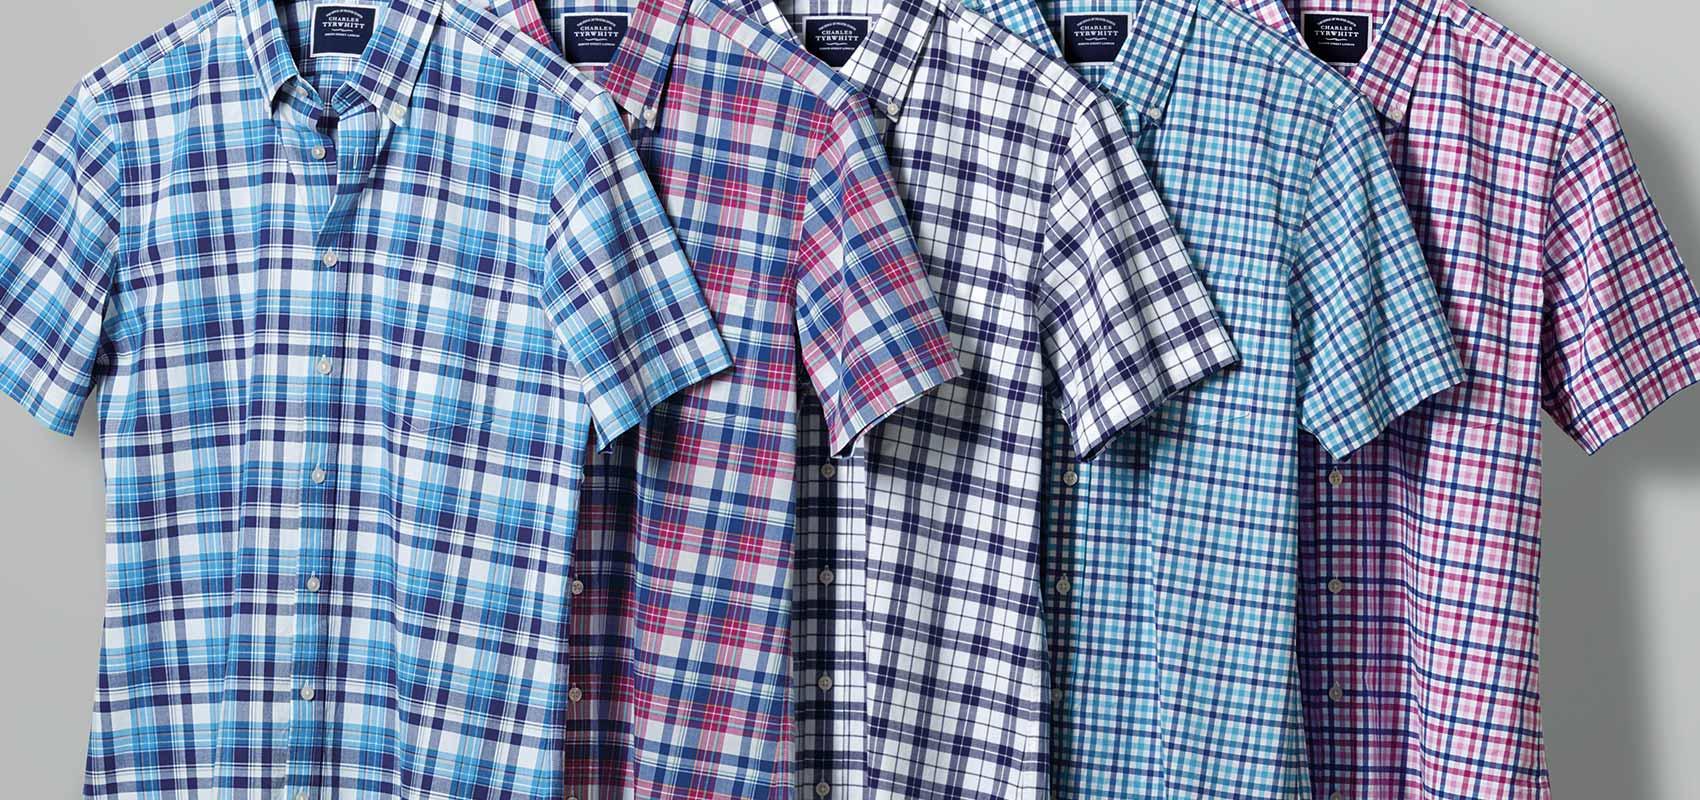 Charles Tyrwhitt Chemises à manches courtes